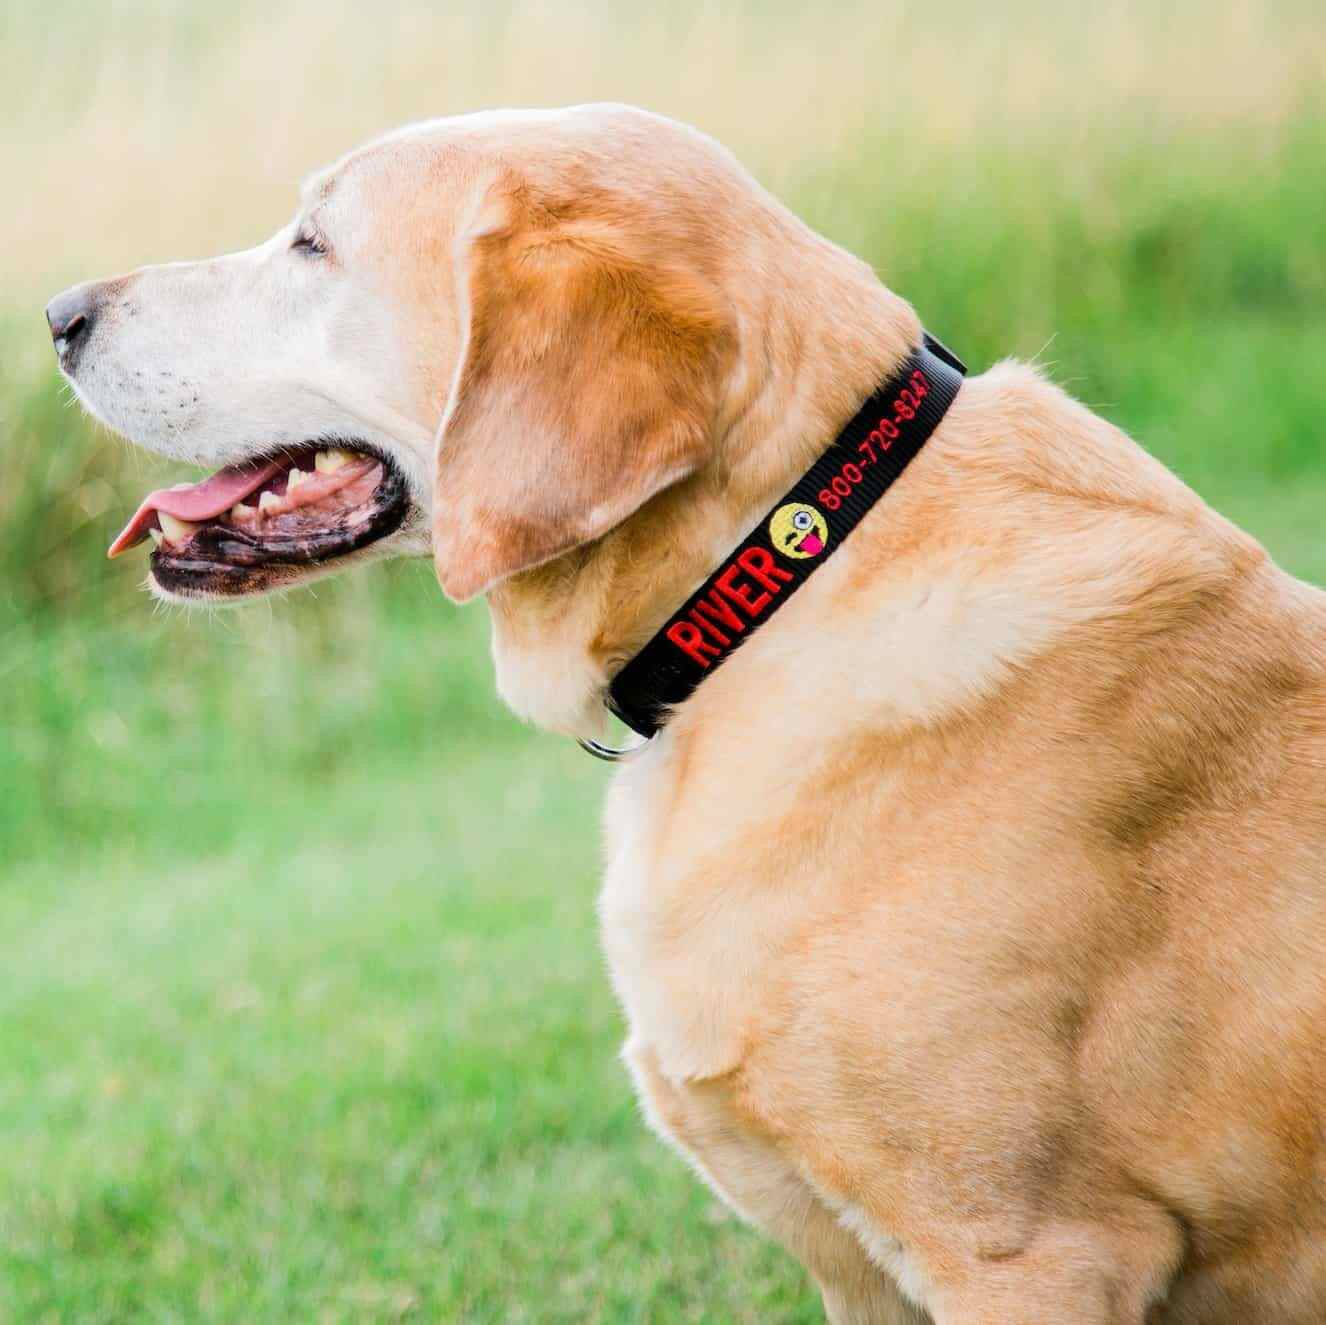 Custom Embroidered Emoji Dog Collar on Yellow Lab